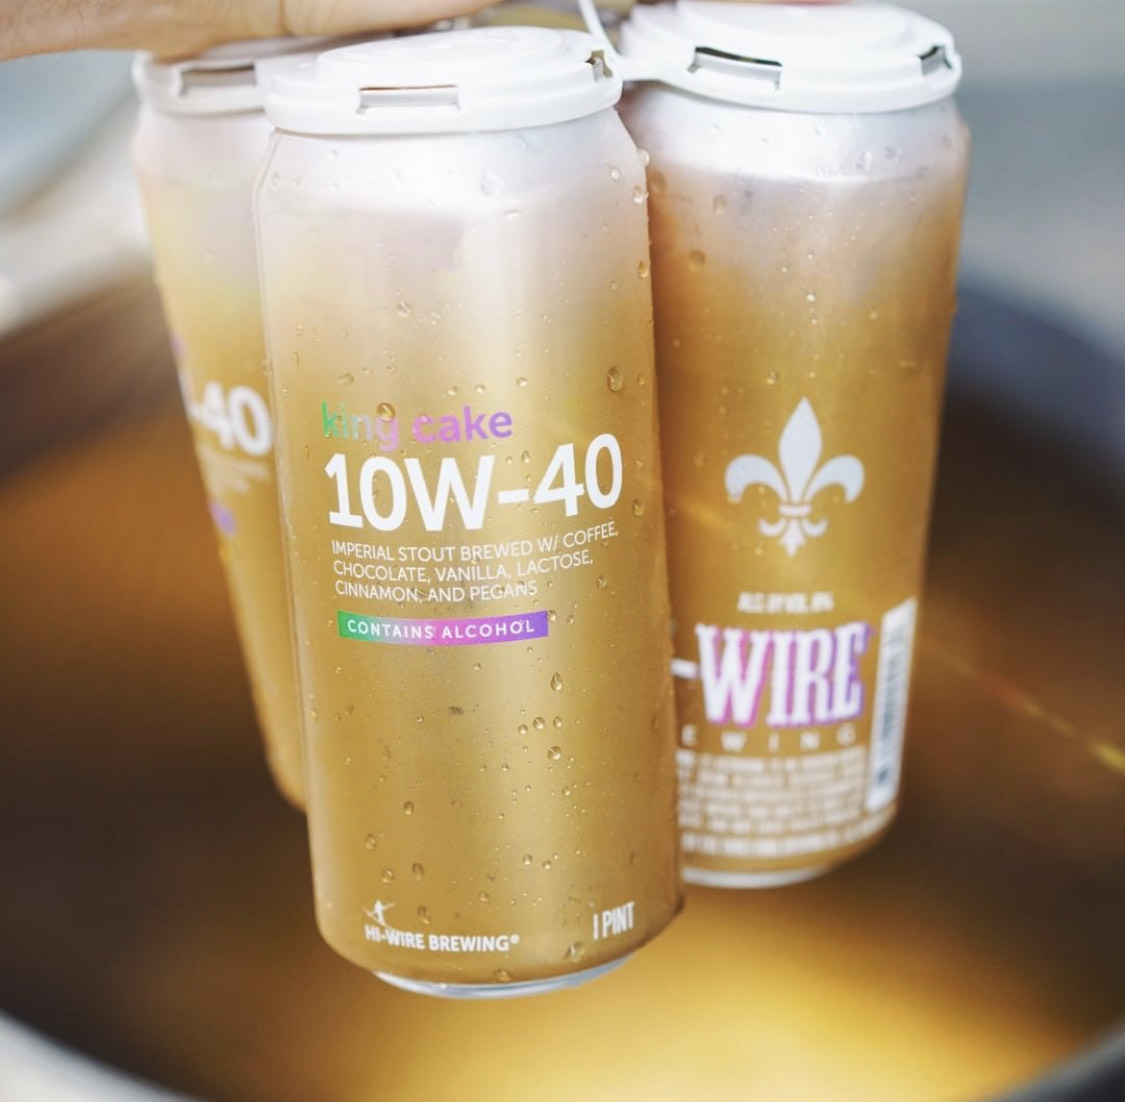 Hi-Wire Brewing King Cake 10W-40